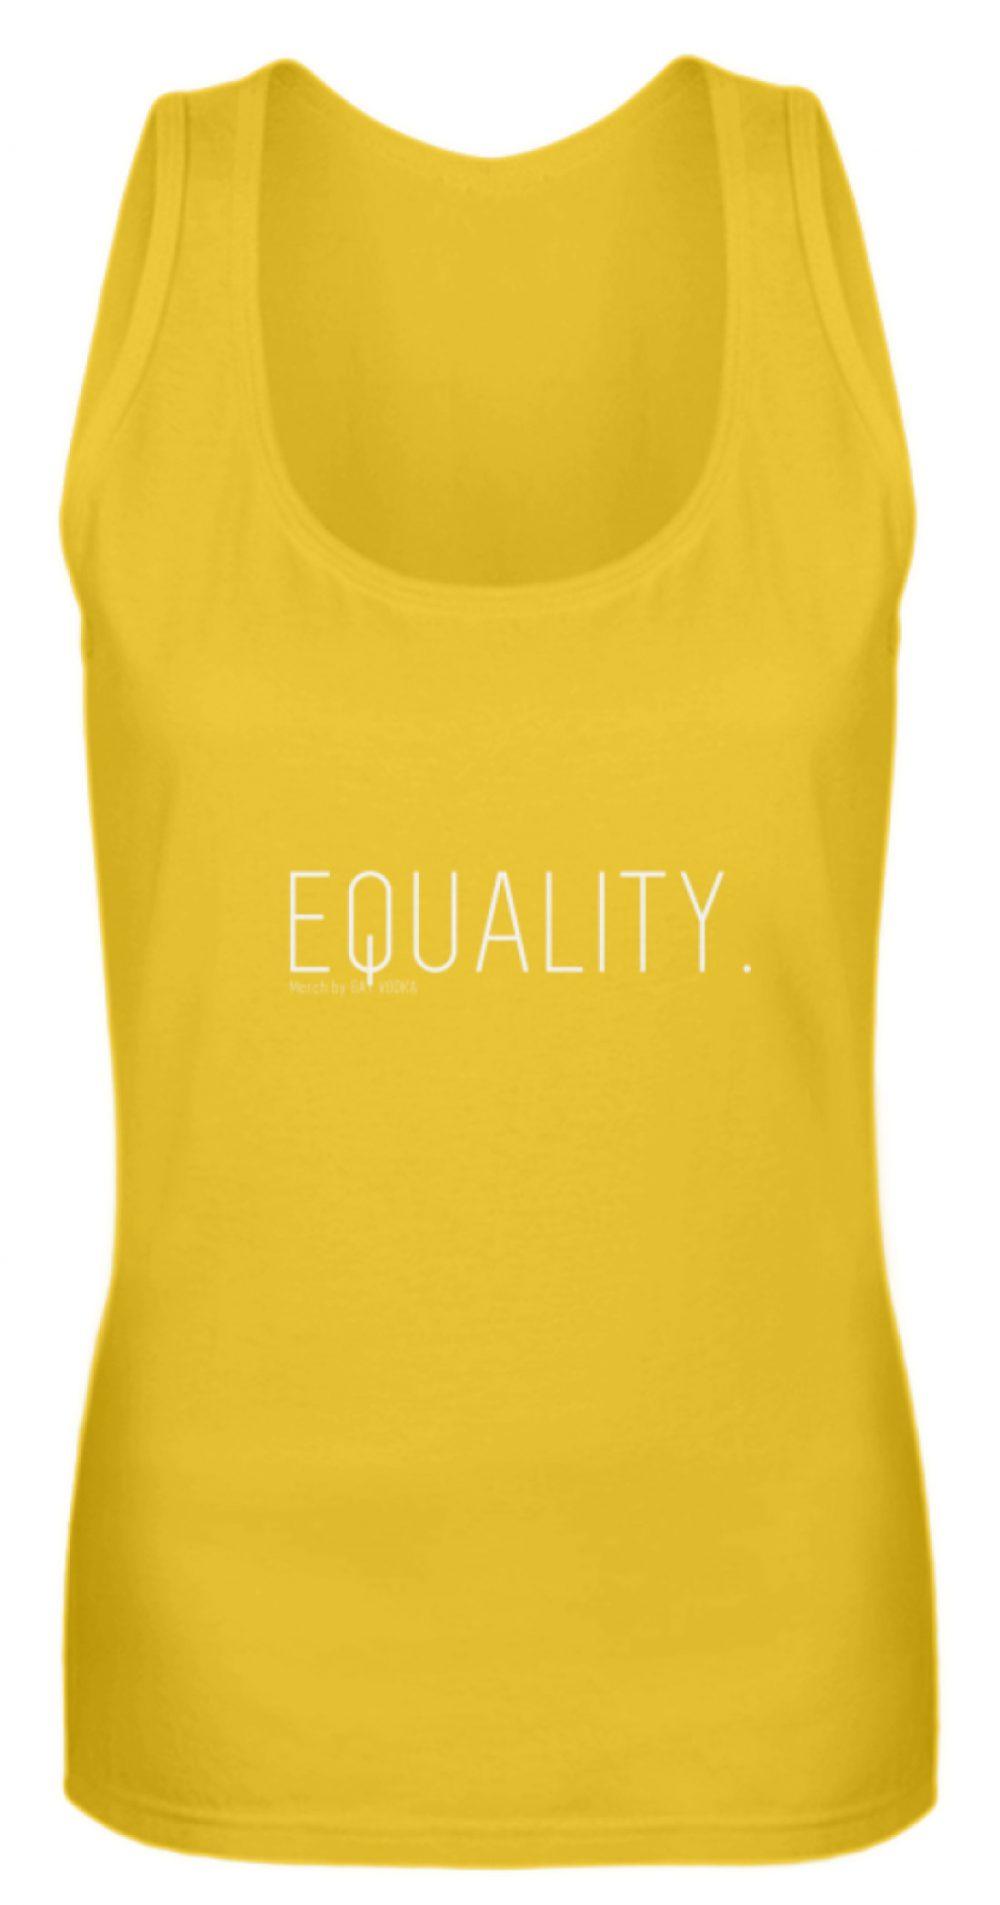 EQUALITY. - Frauen Tanktop-3201